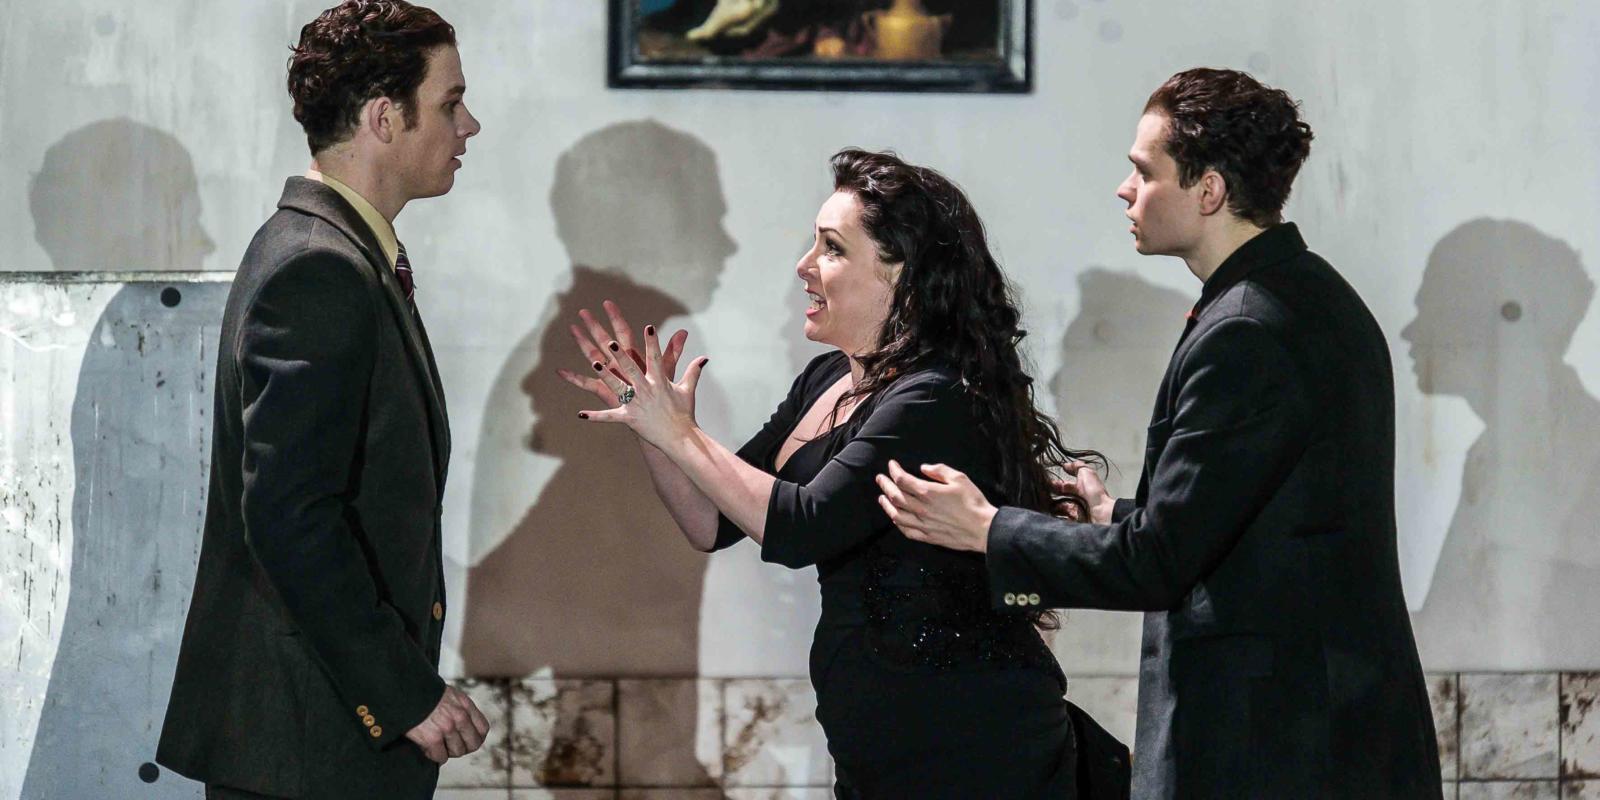 An image of Christopher Ainslie, Rebecca Evans and Matt Casey in Richard Jones's 2014 production of Rodelinda